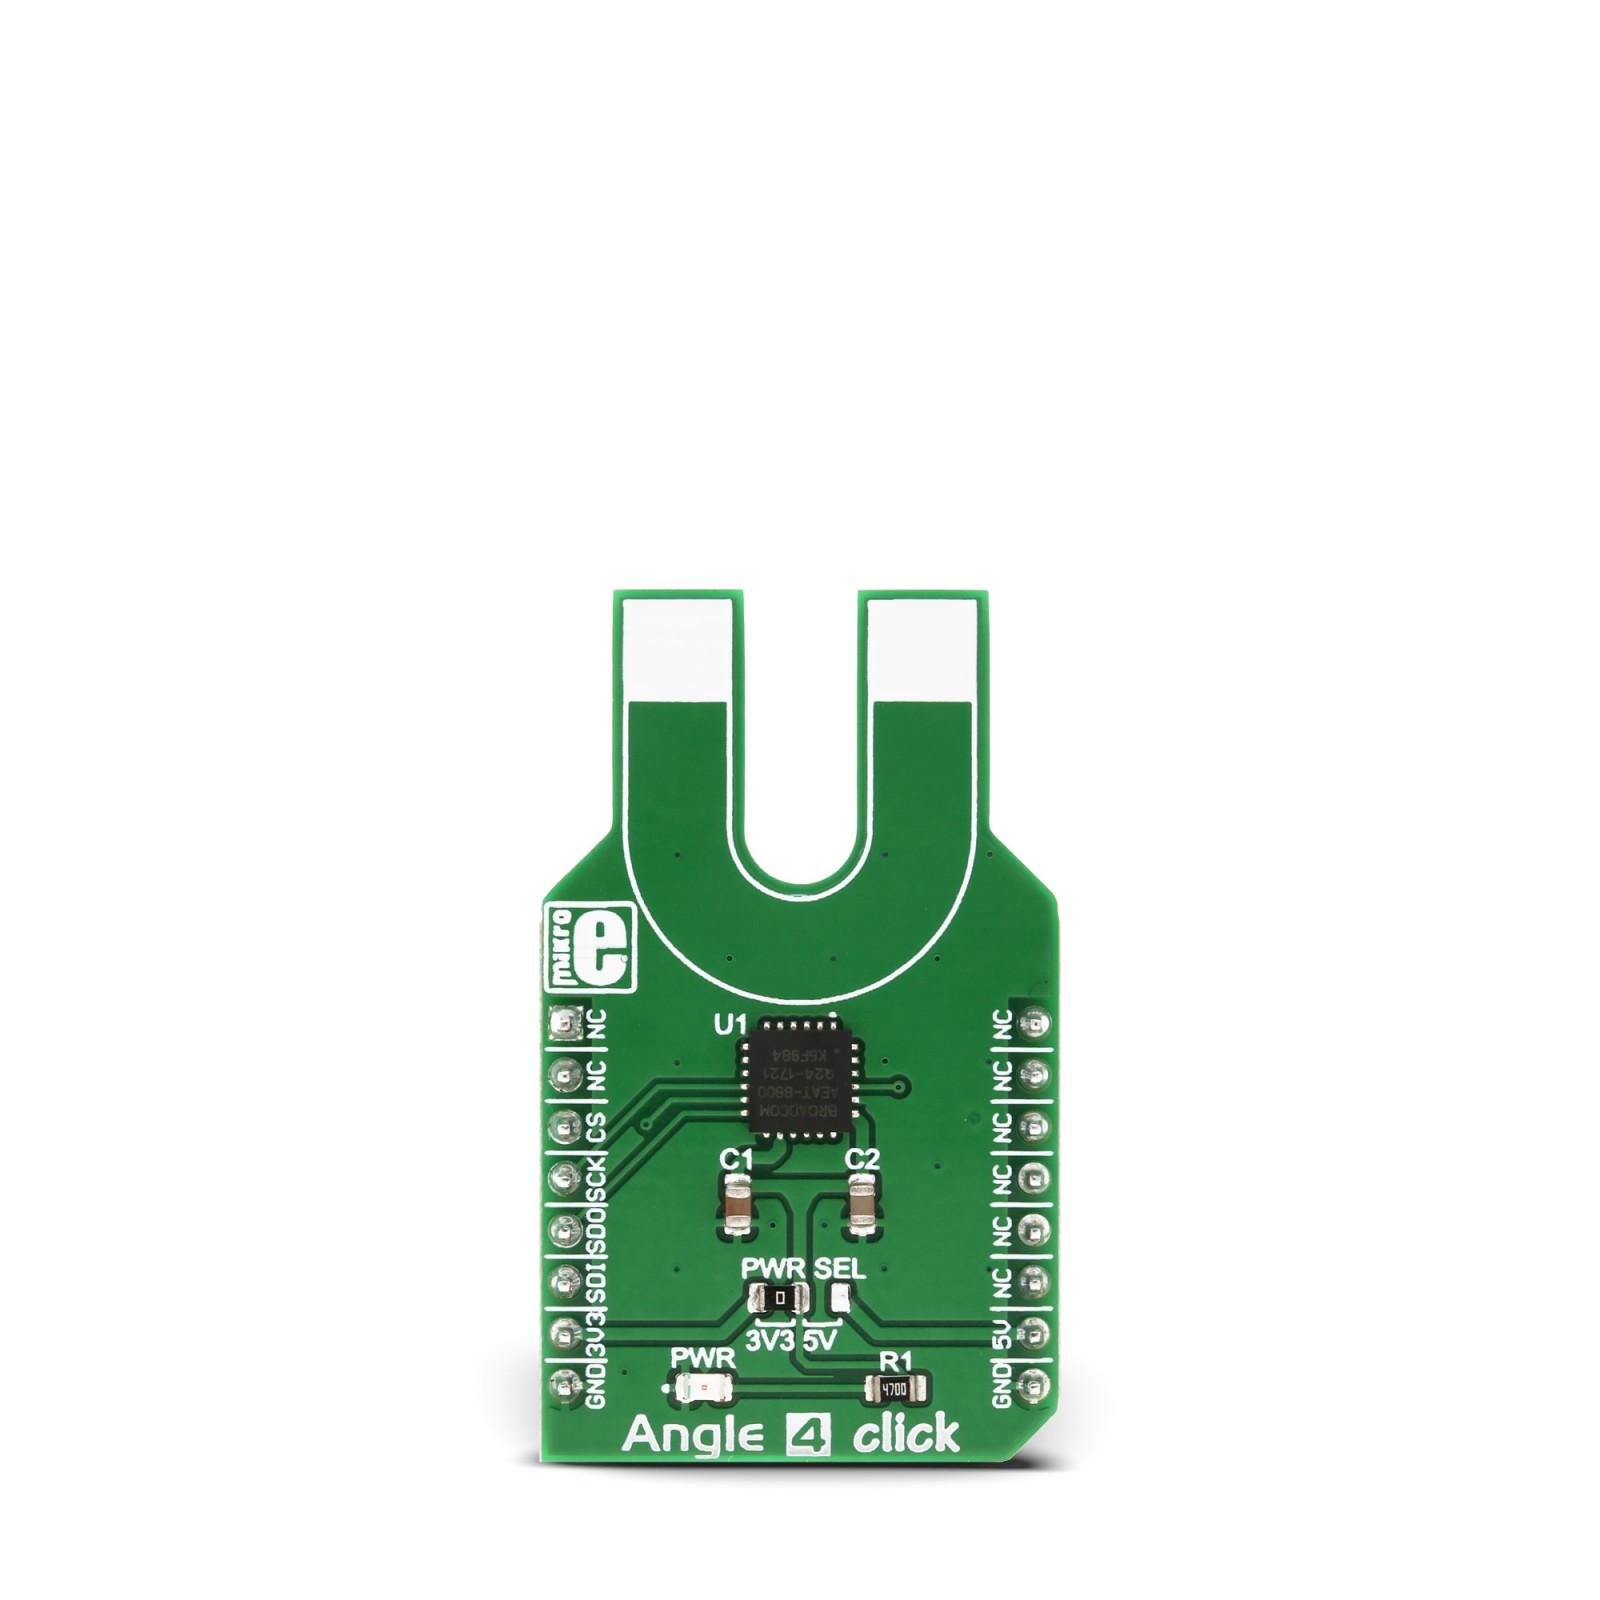 Angle 4 Click Mikroelektronika On A Circuit Diagram The Symbols For Components Are Labelled Mgctlbxnmzp Mgctlbxv5112 Mgctlbxlc Mgctlbxpprestashop